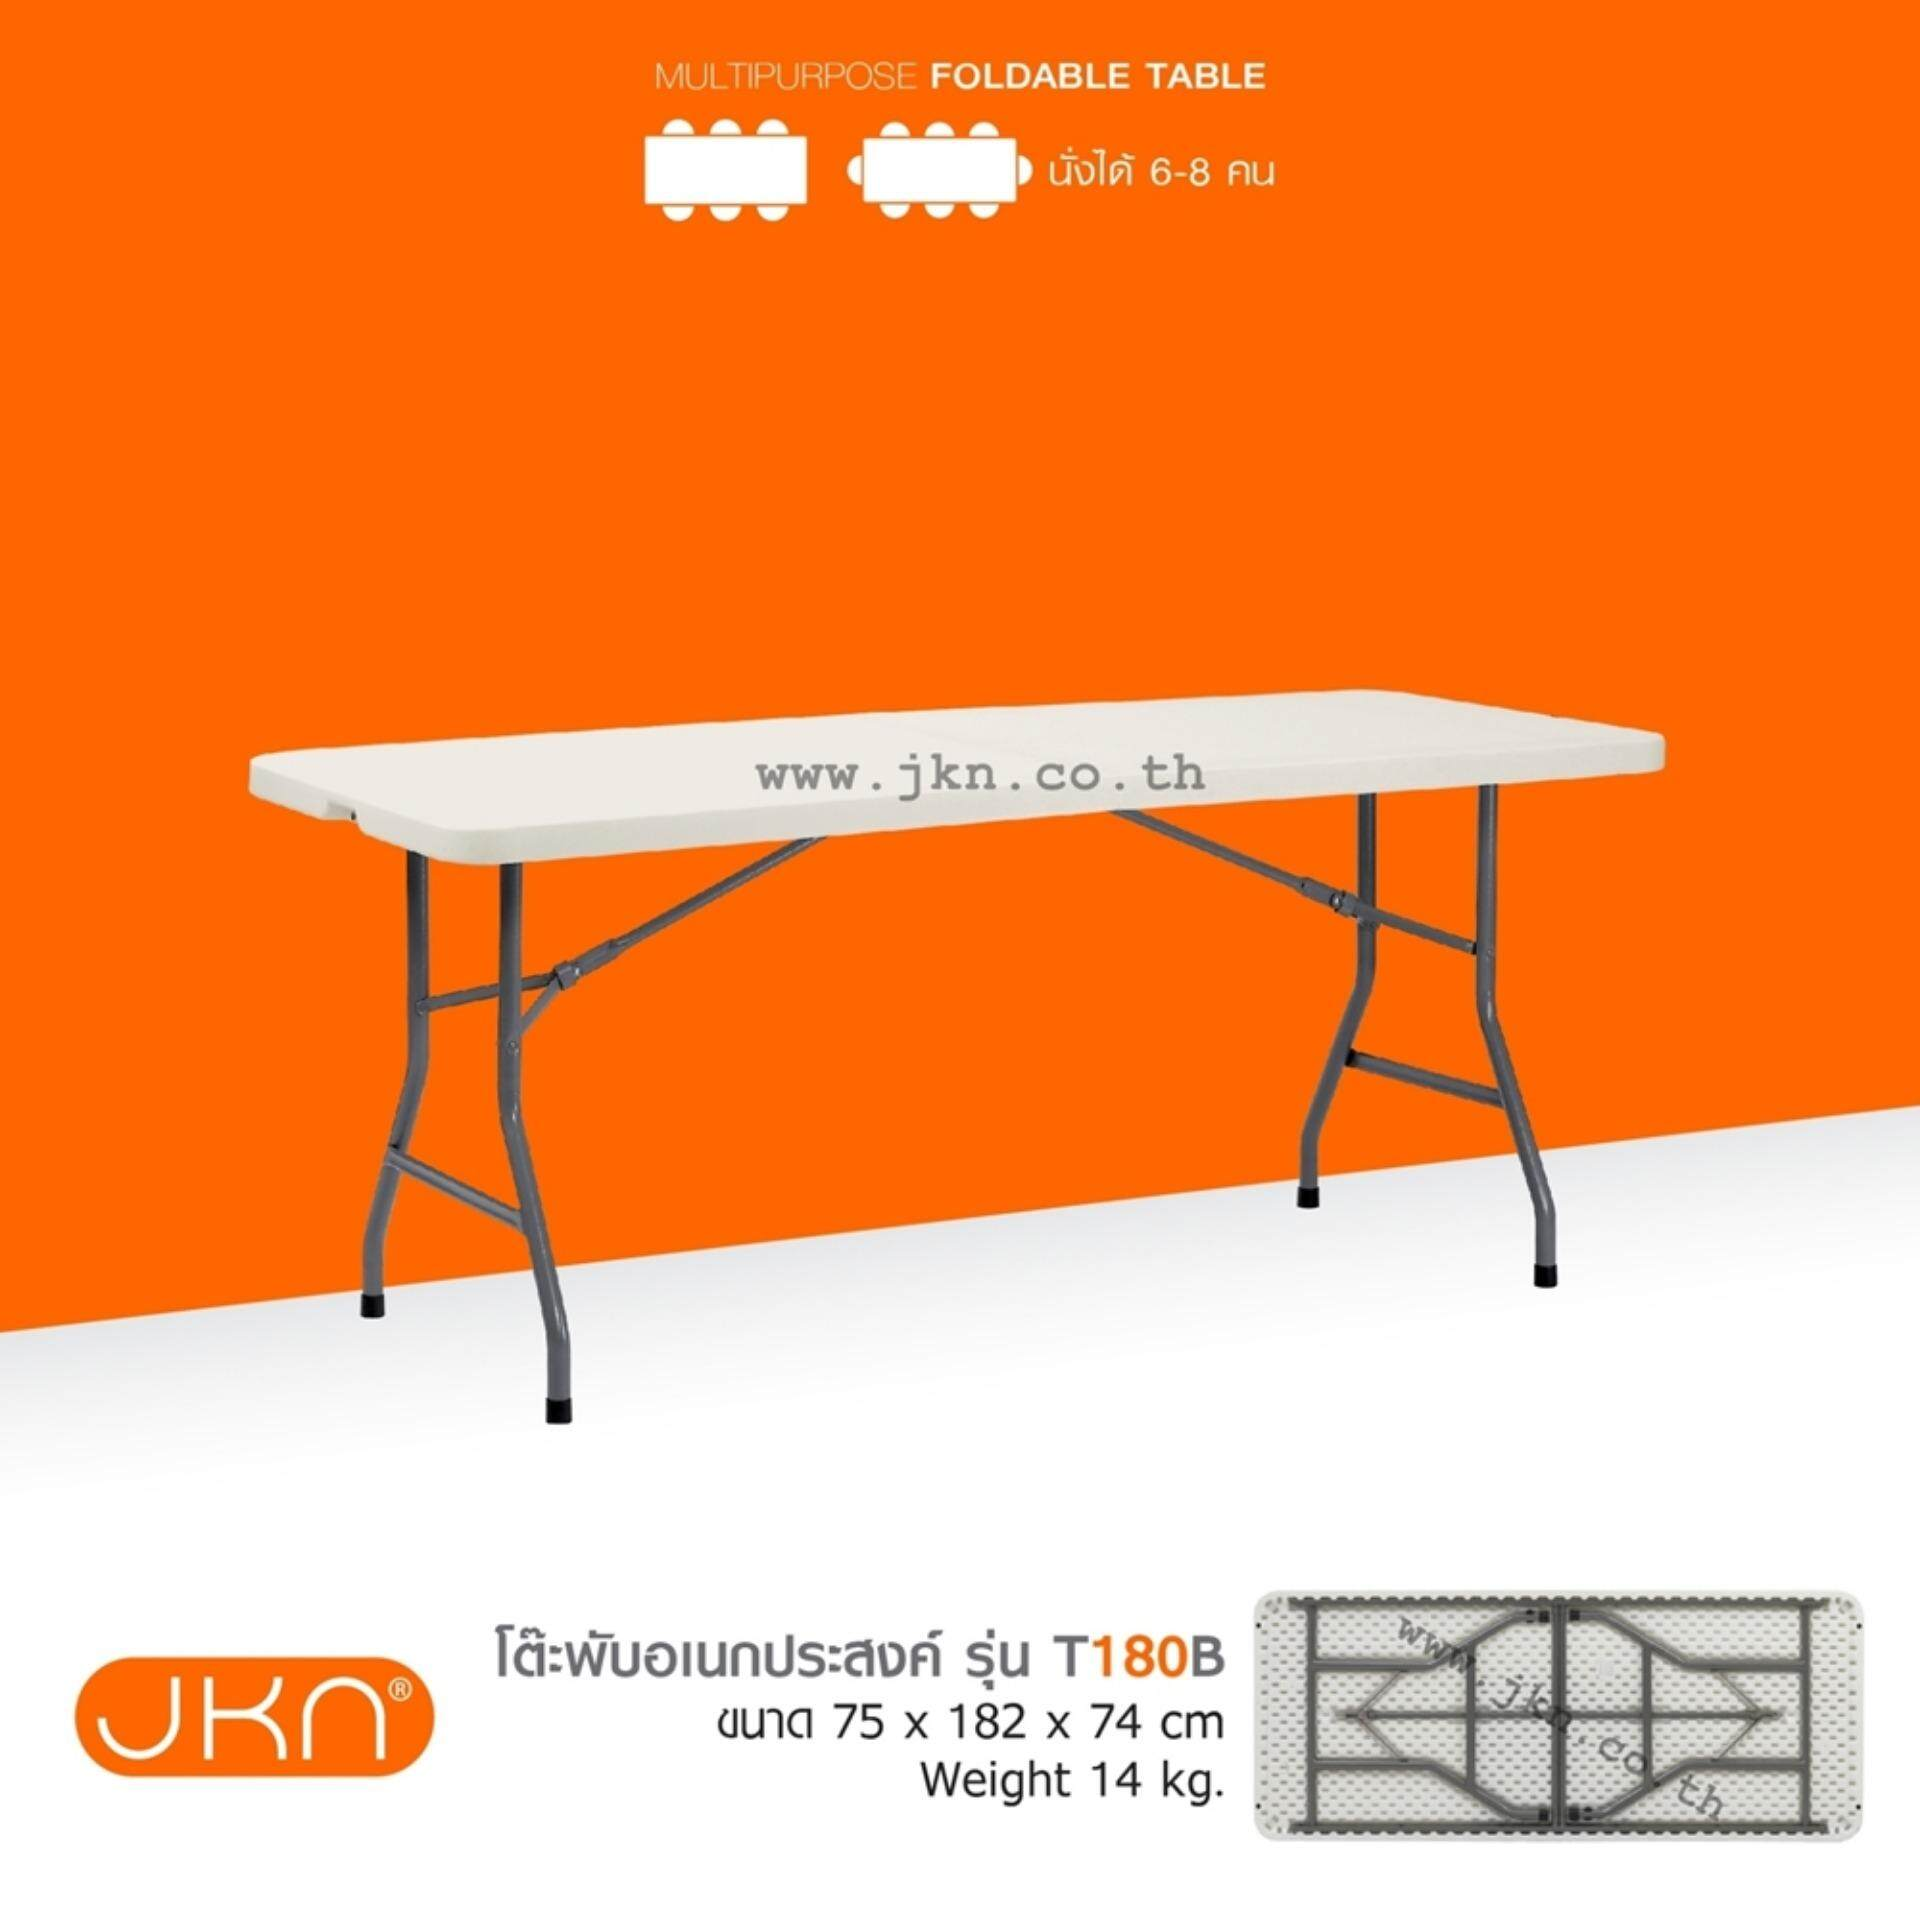 Jkn โต๊ะพับอเนกประสงค์ รุ่น T-180b By Mc Plus.